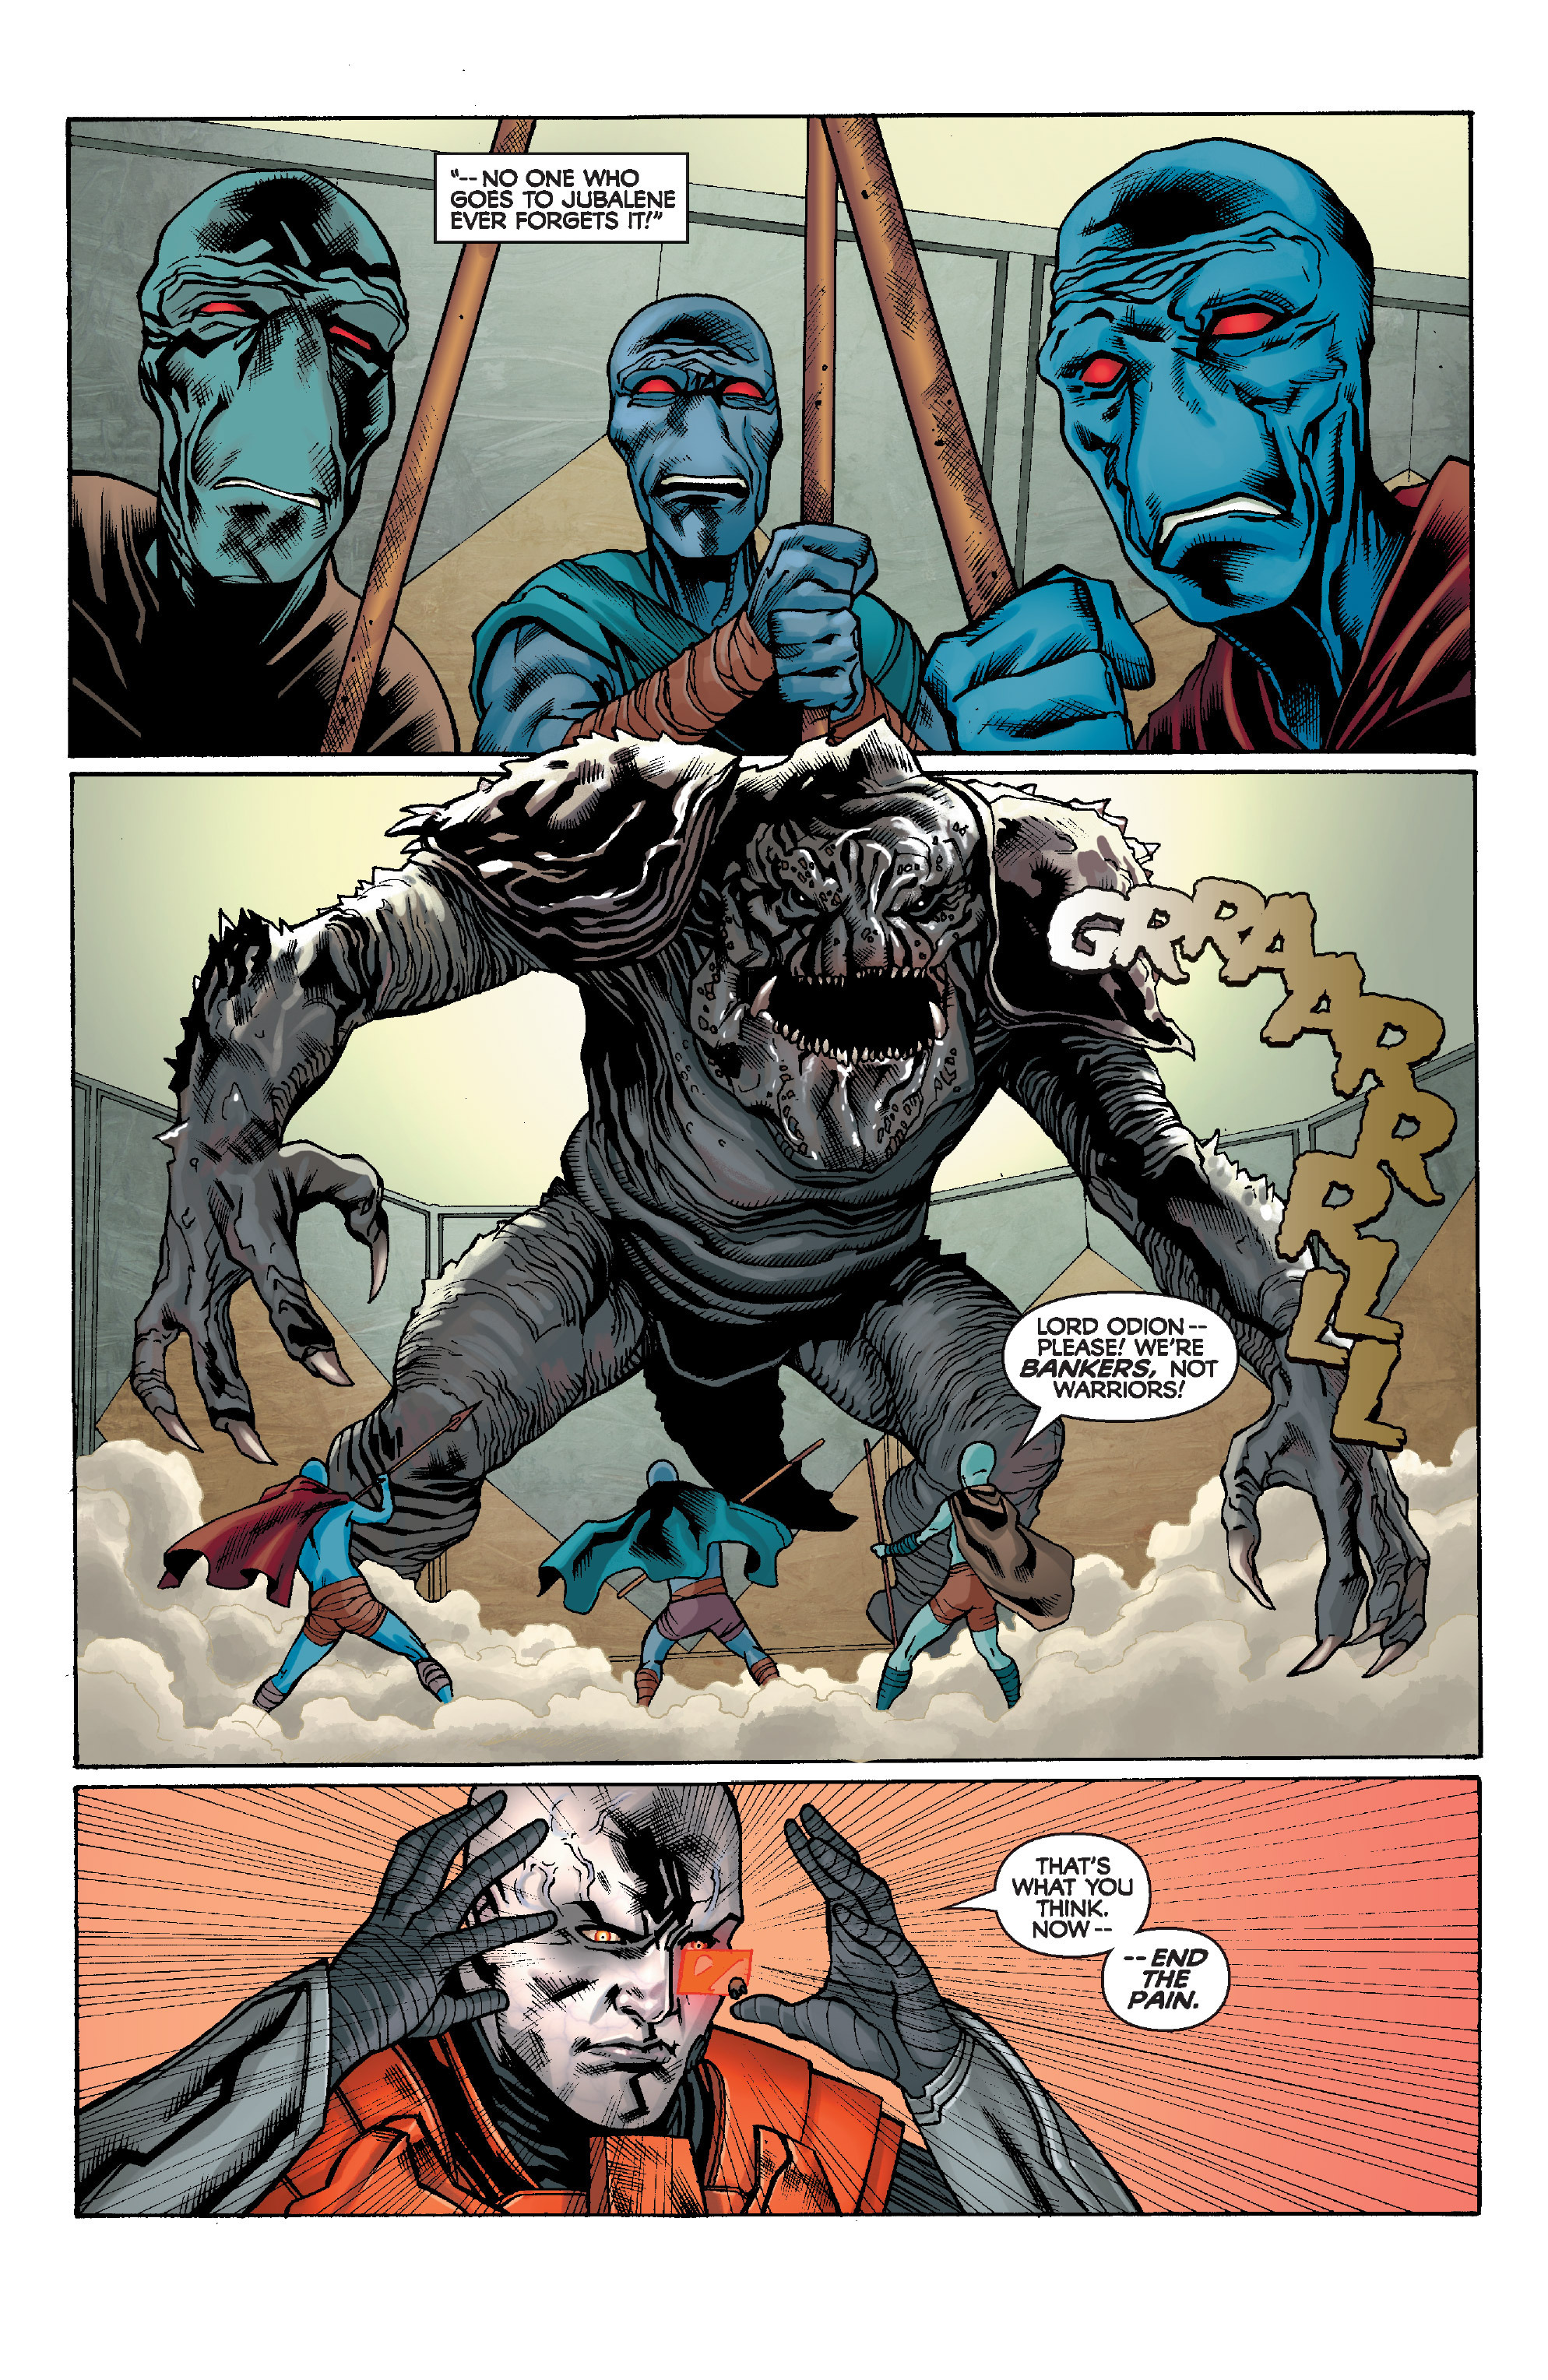 Read online Star Wars: Knight Errant - Escape comic -  Issue #1 - 16